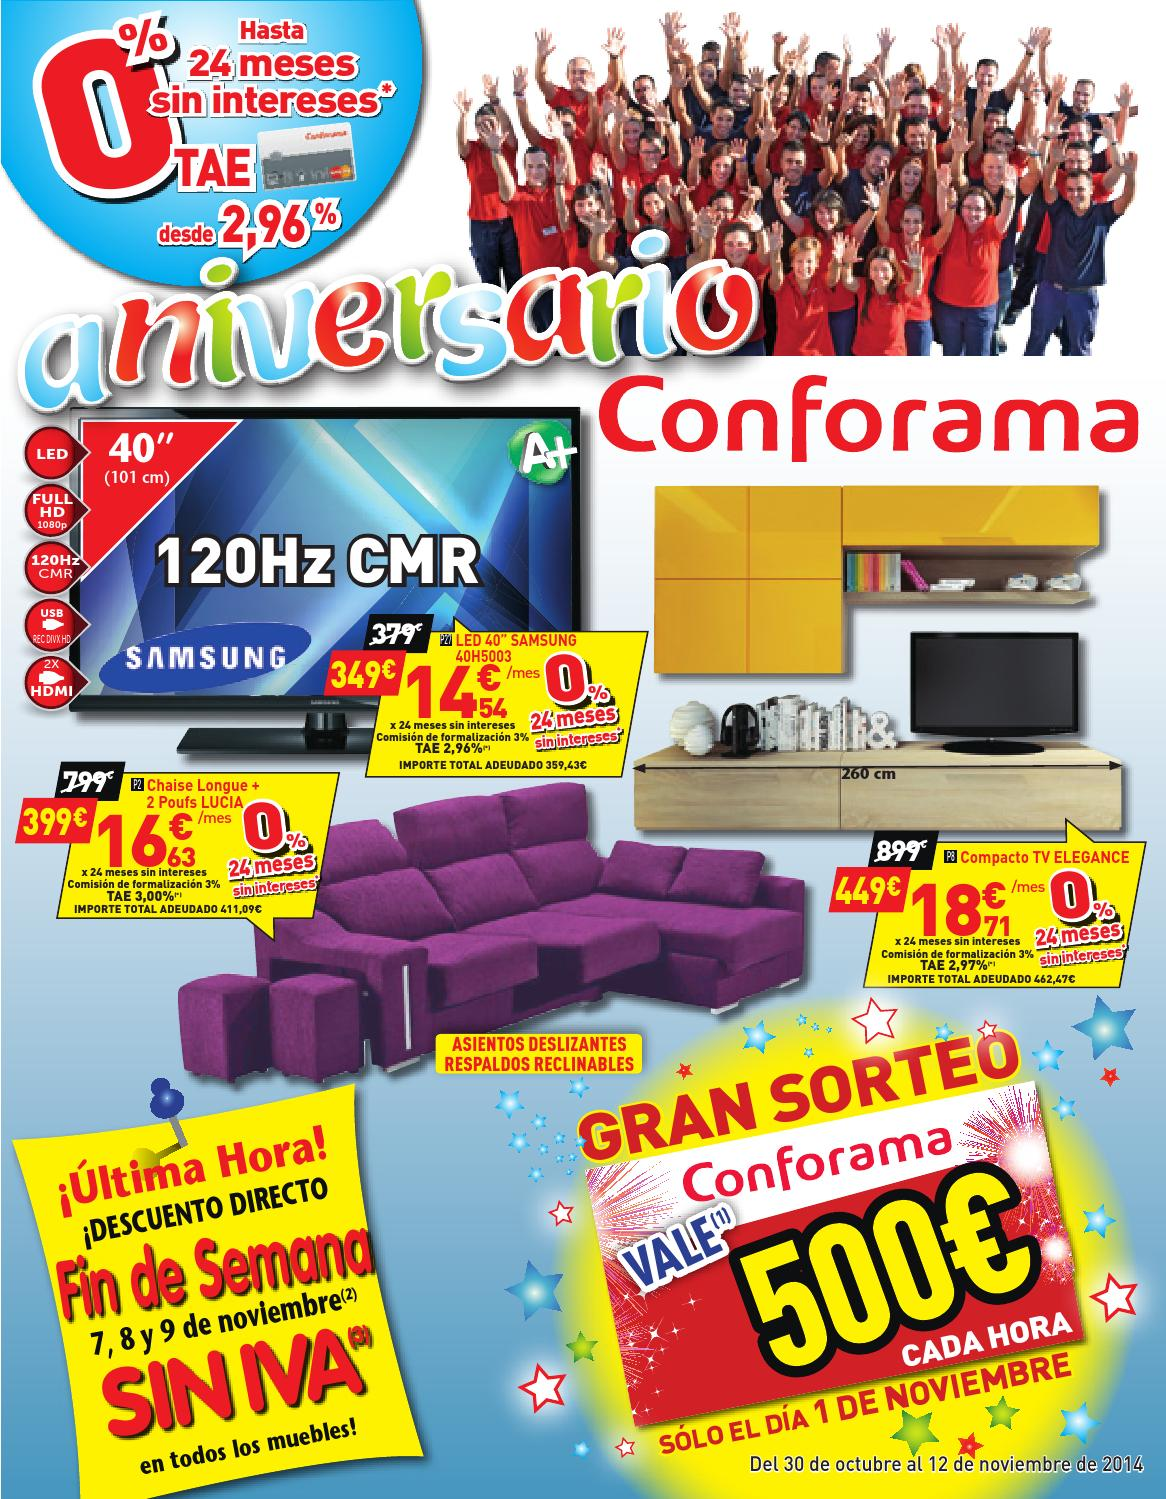 Conforama catalogo 30octubre 12noviembre2014 by - Conforama sevilla catalogo ...